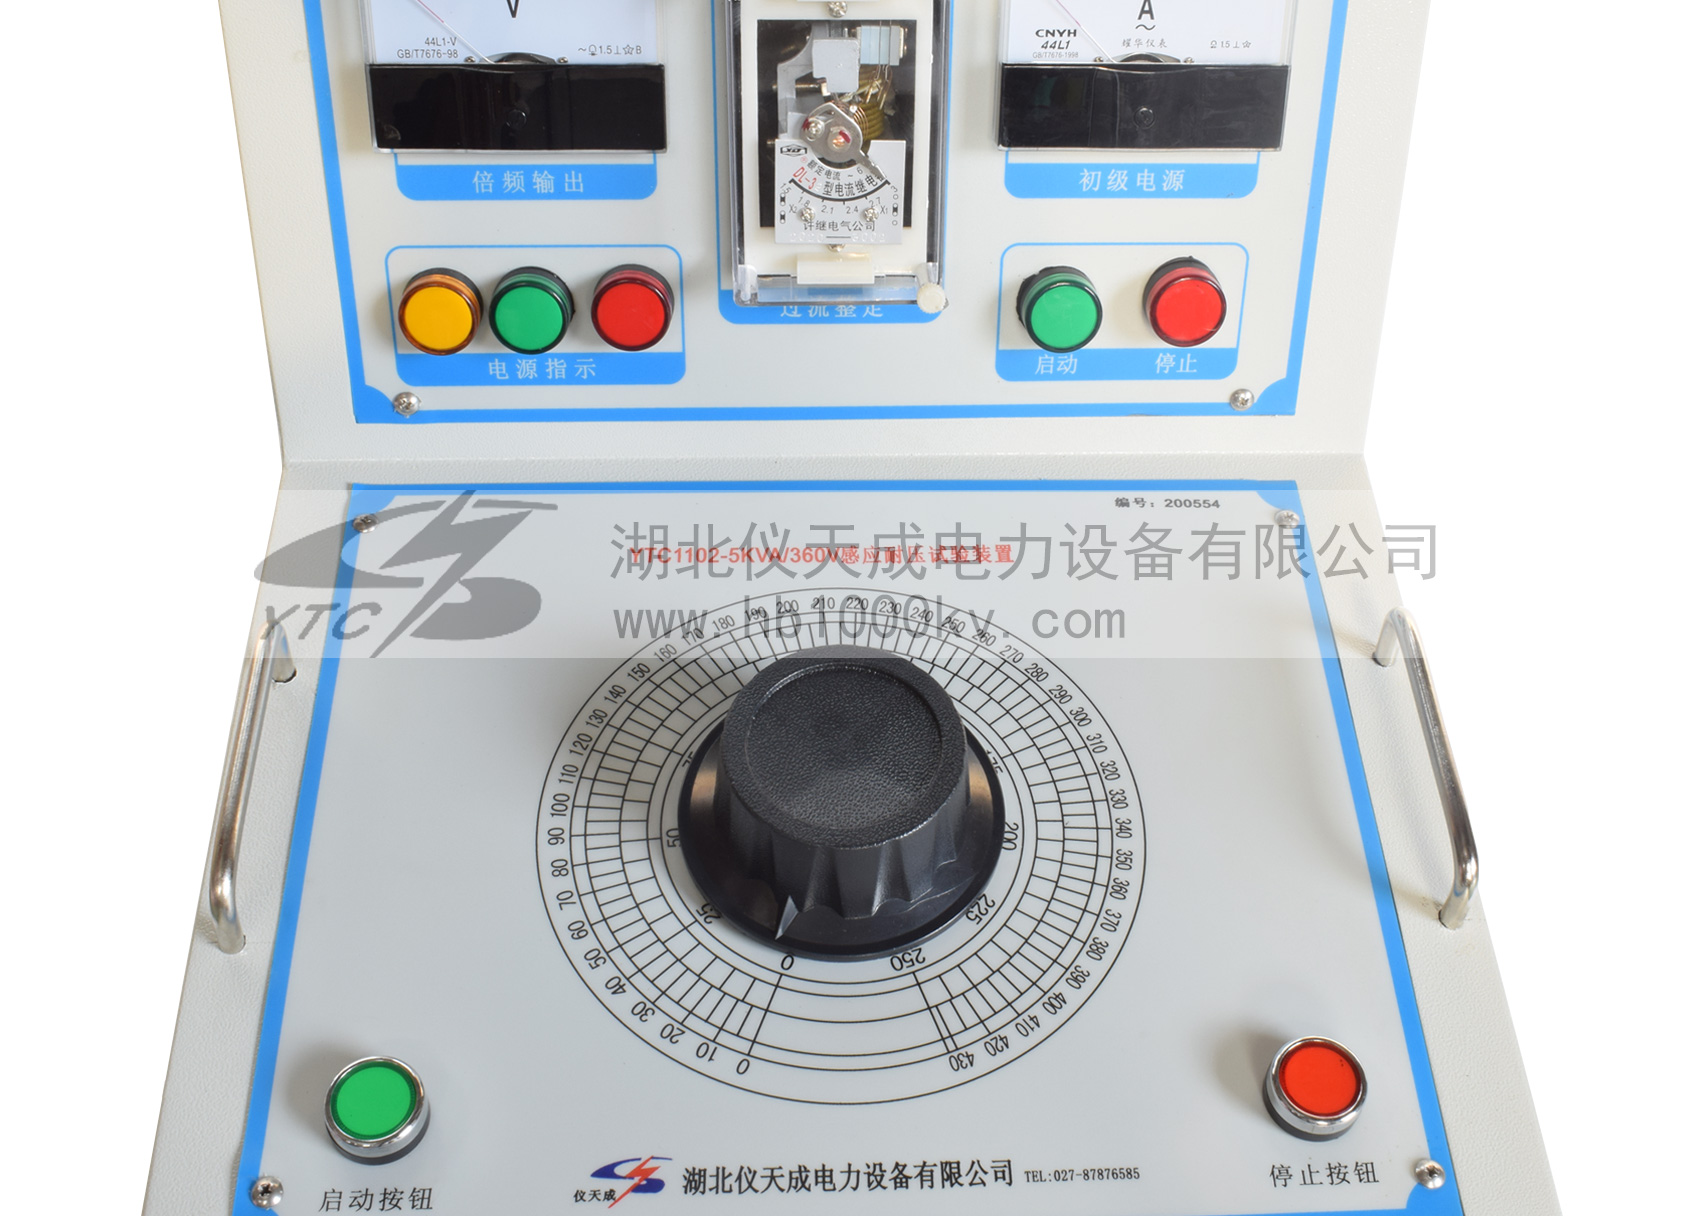 YTC1102系列三倍频电源发生器面板图